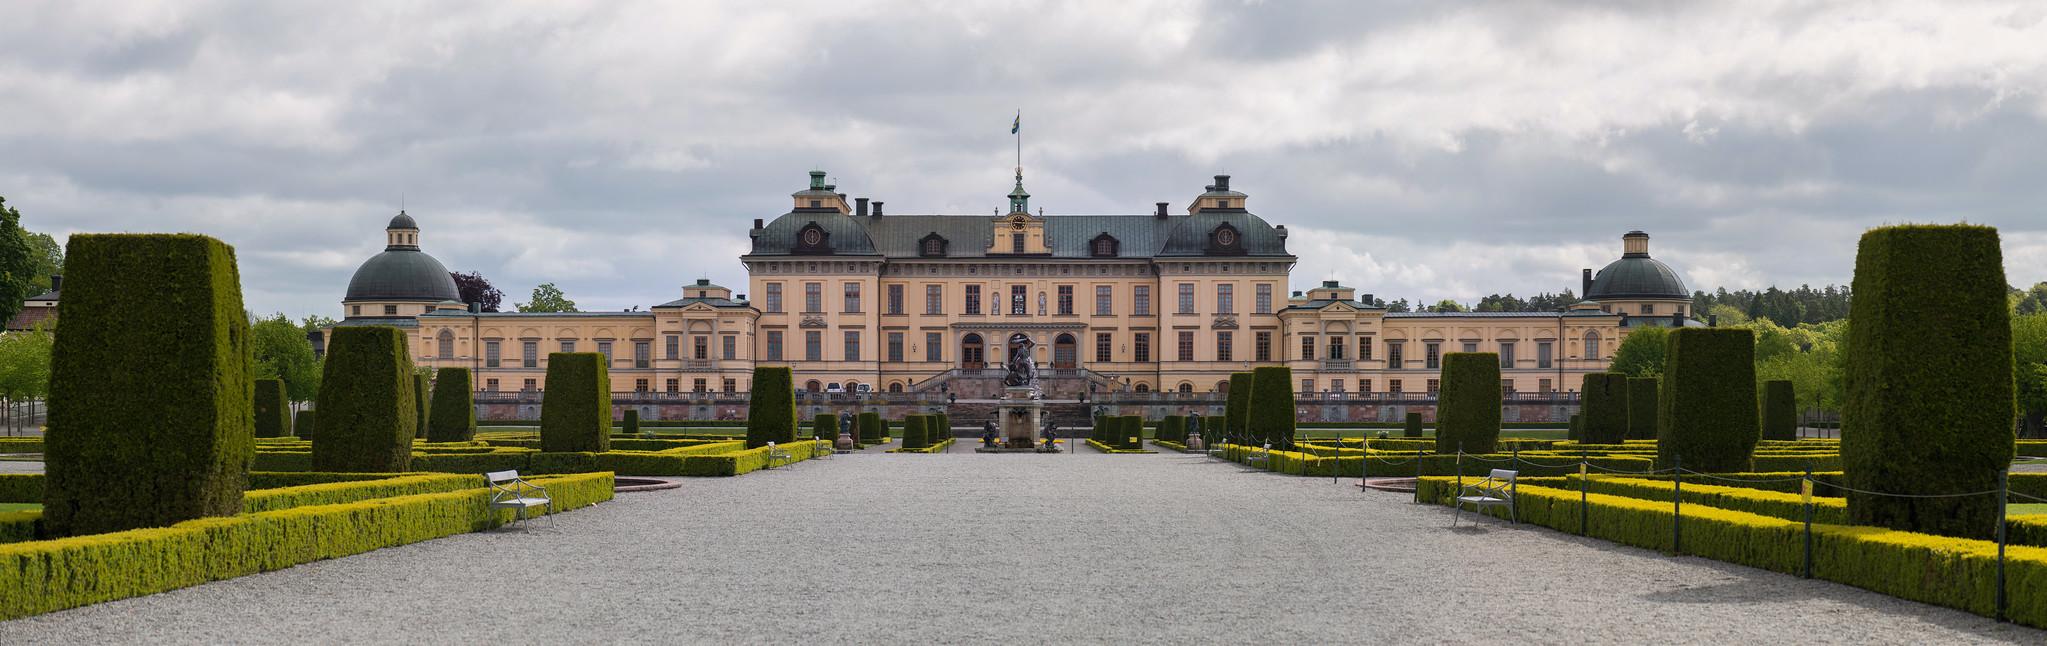 Drottningholm Palace Panorama